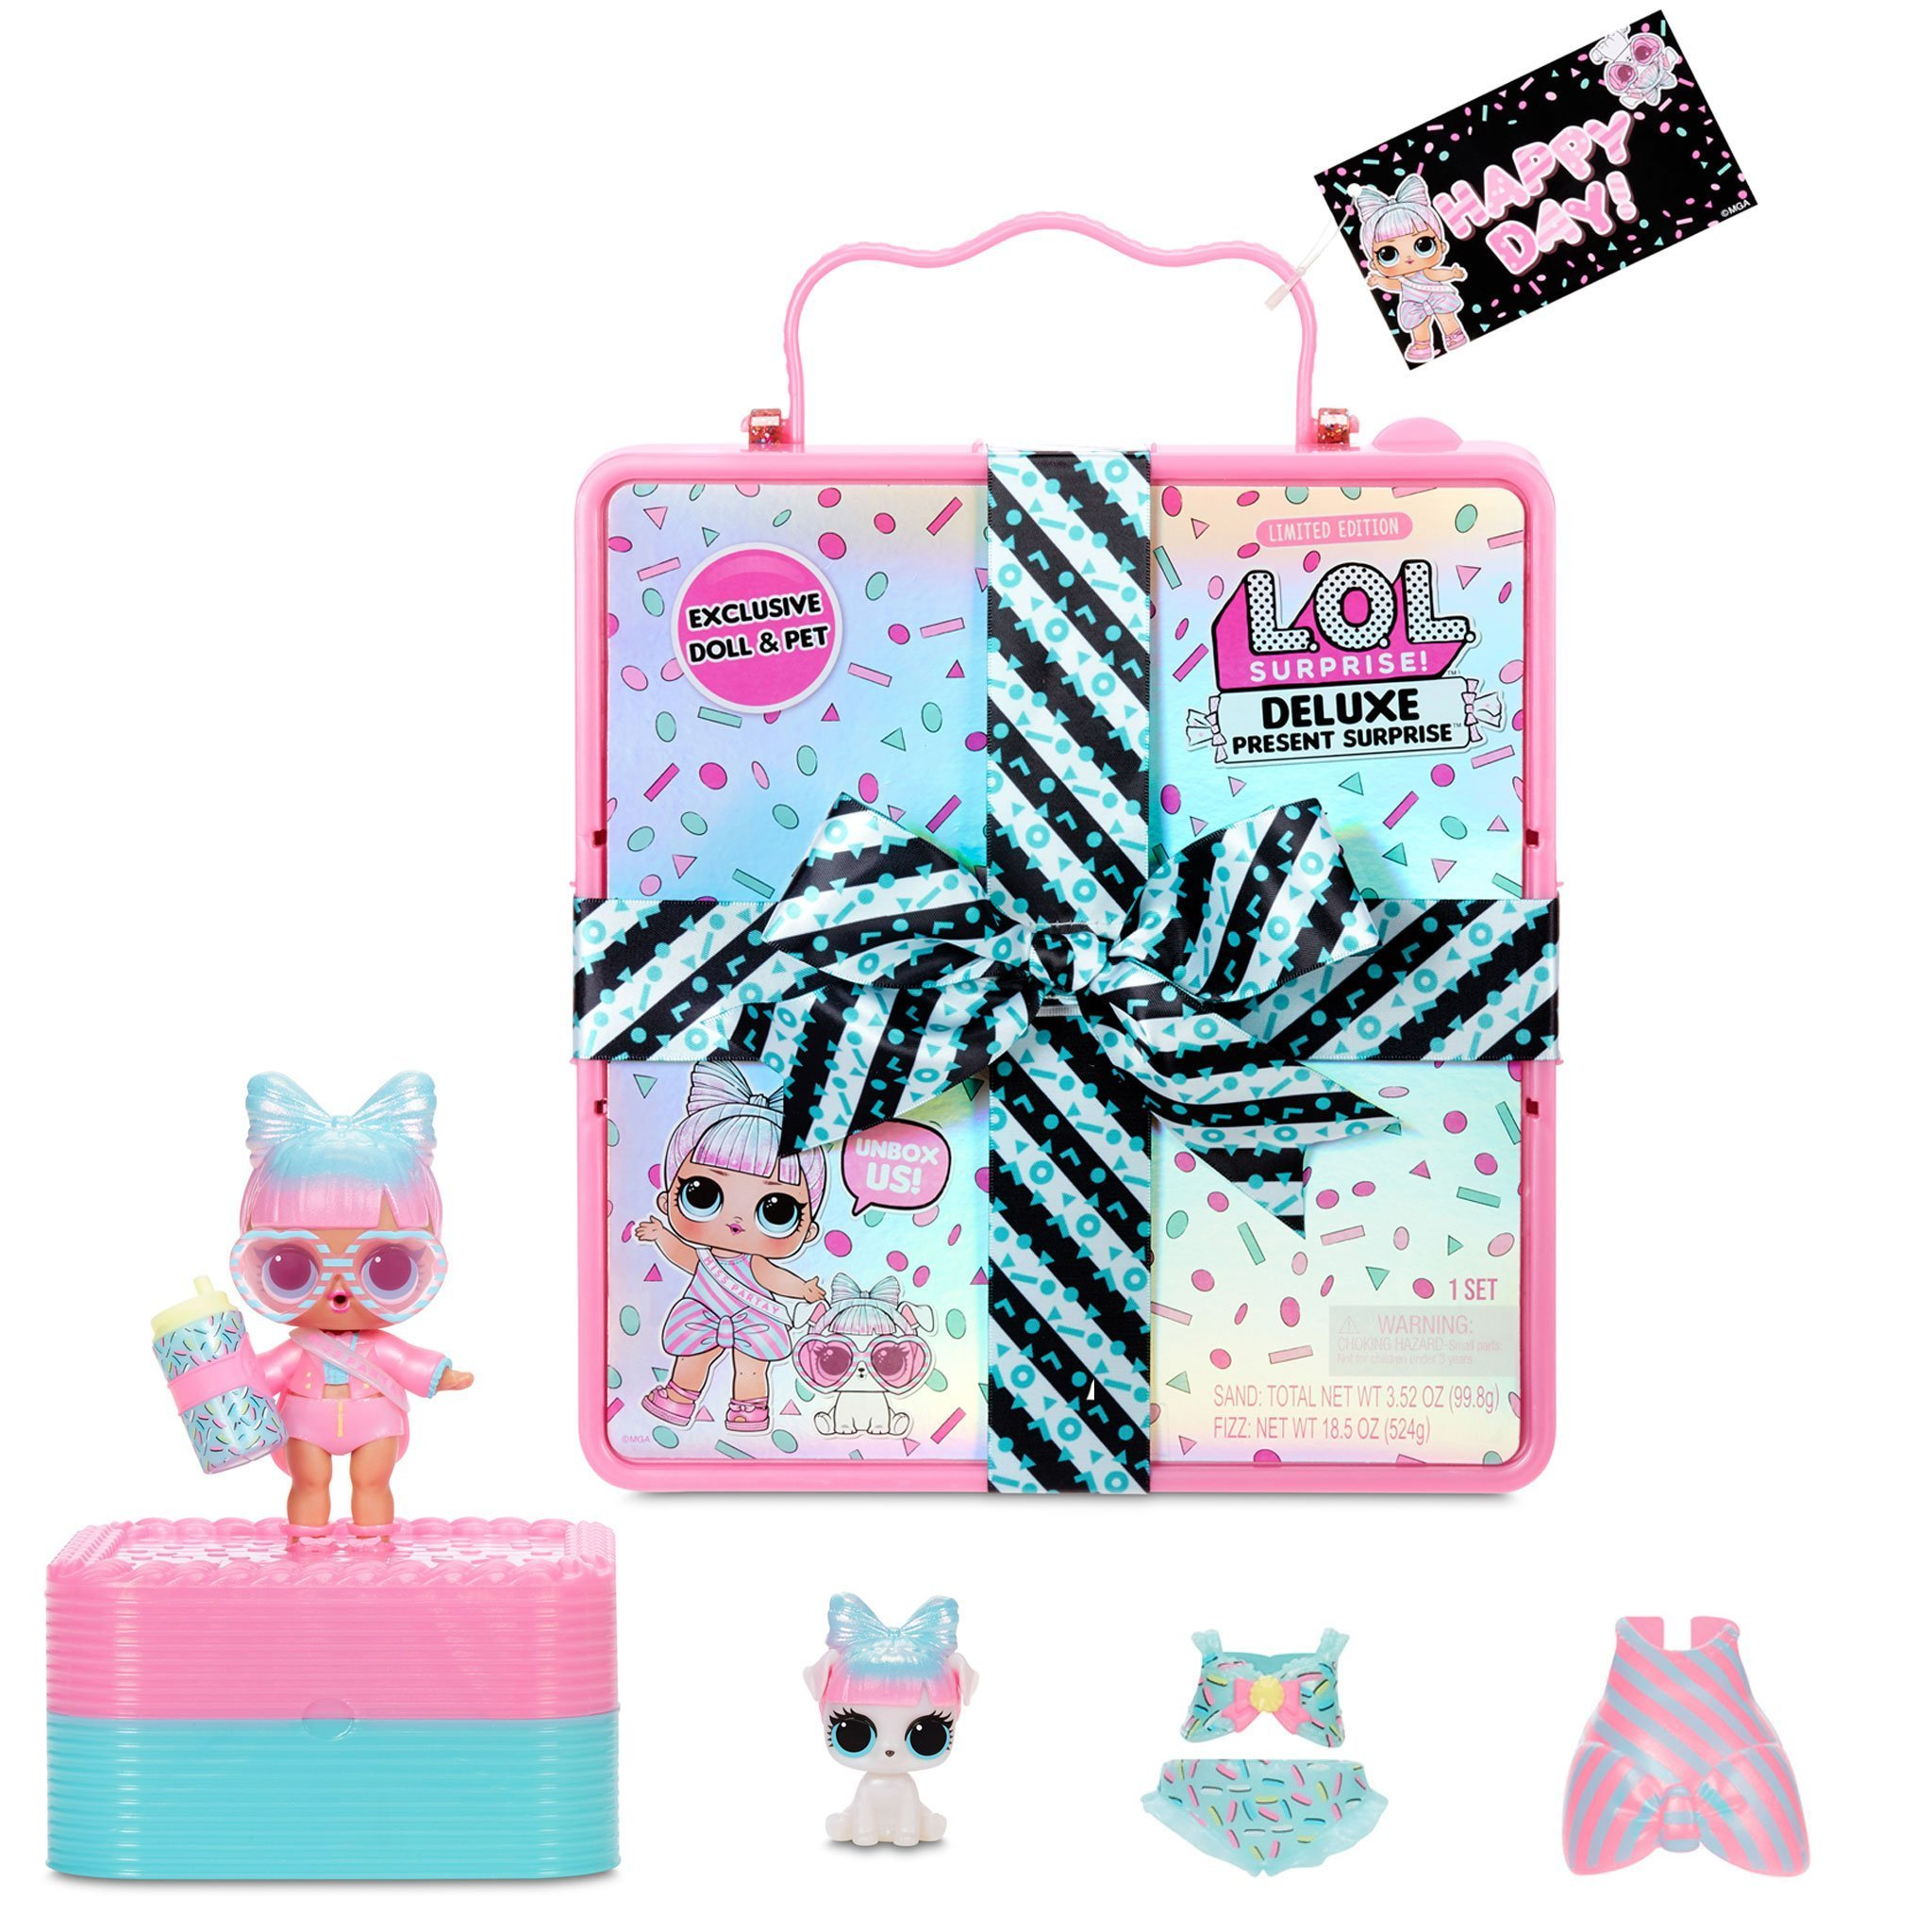 LOL Surprise MGA Deluxe Present Pink pārsteiguma komplekts